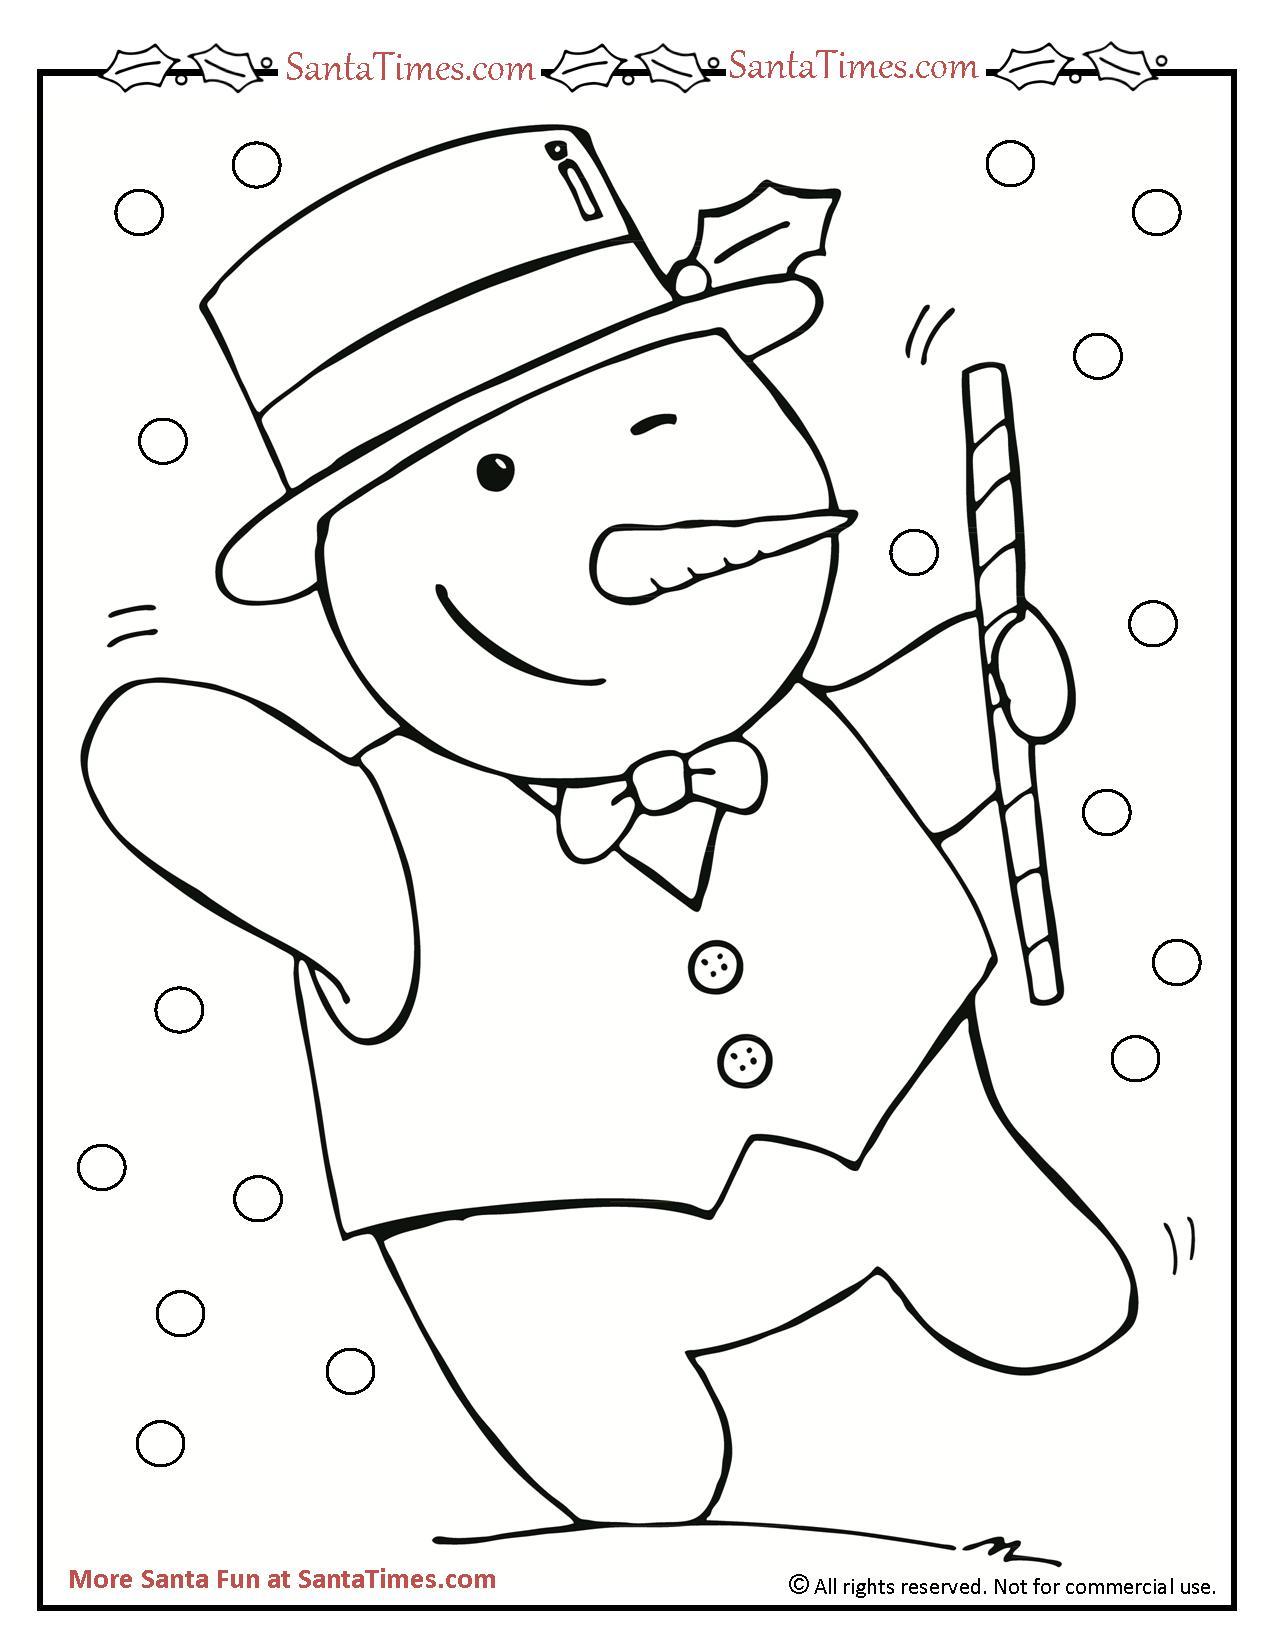 dancing snowman printable coloring page